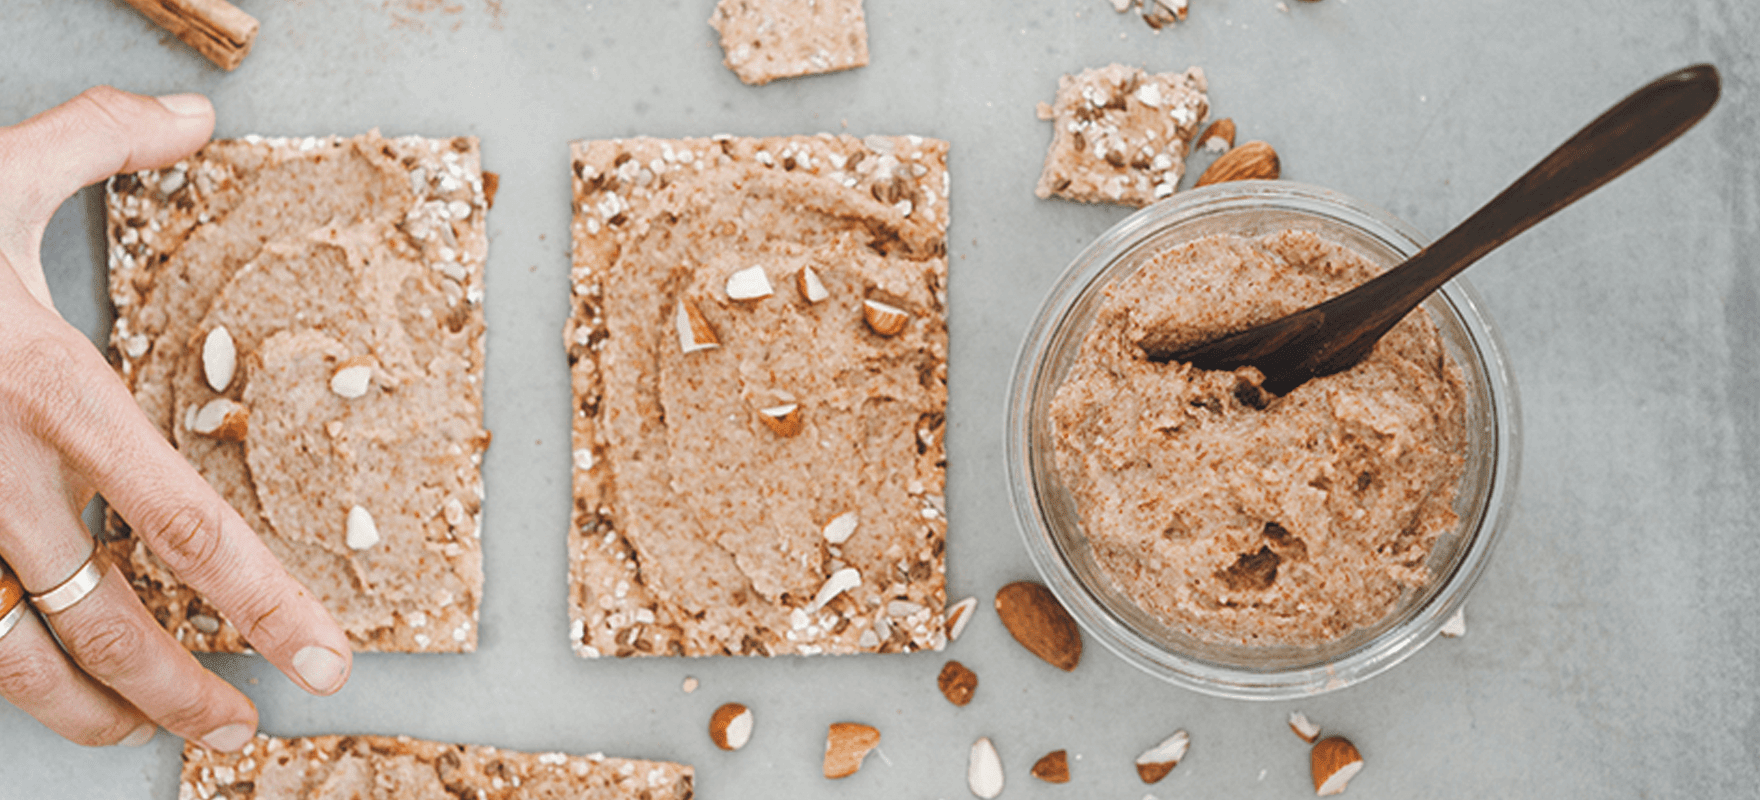 Cinnamon almond butter image 3